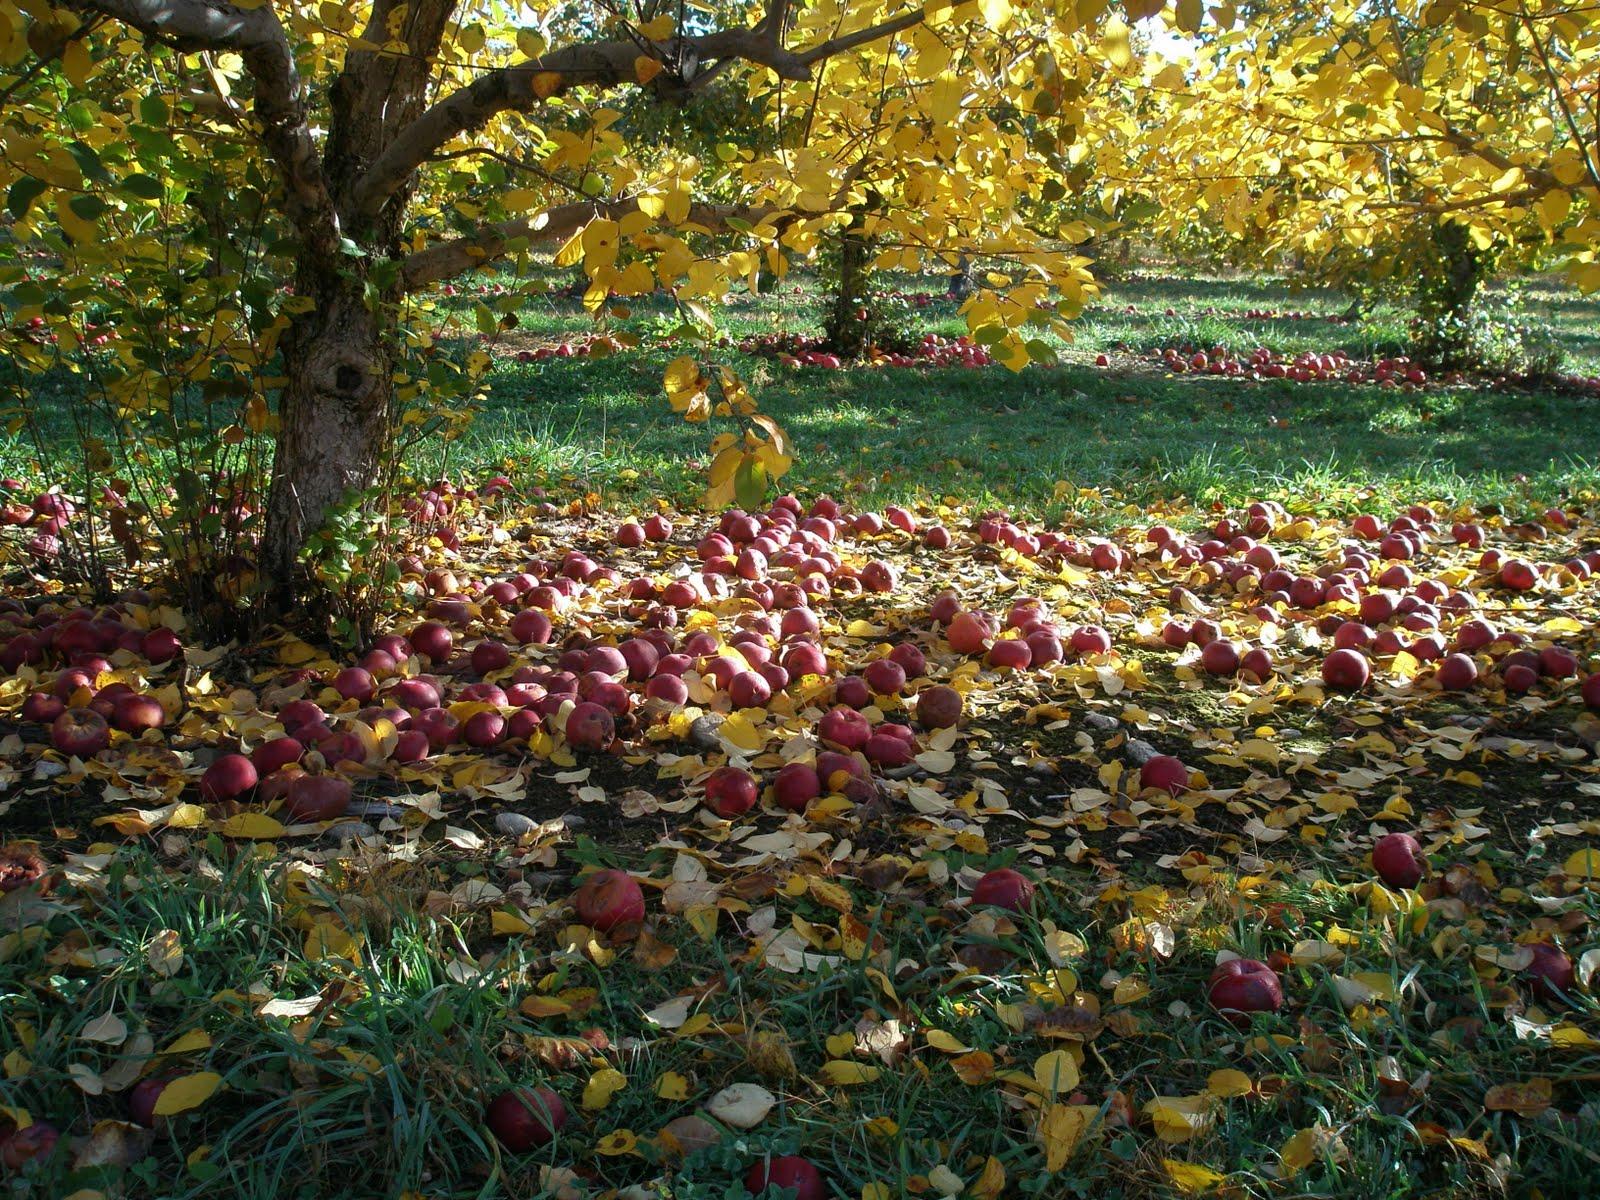 Apples ground